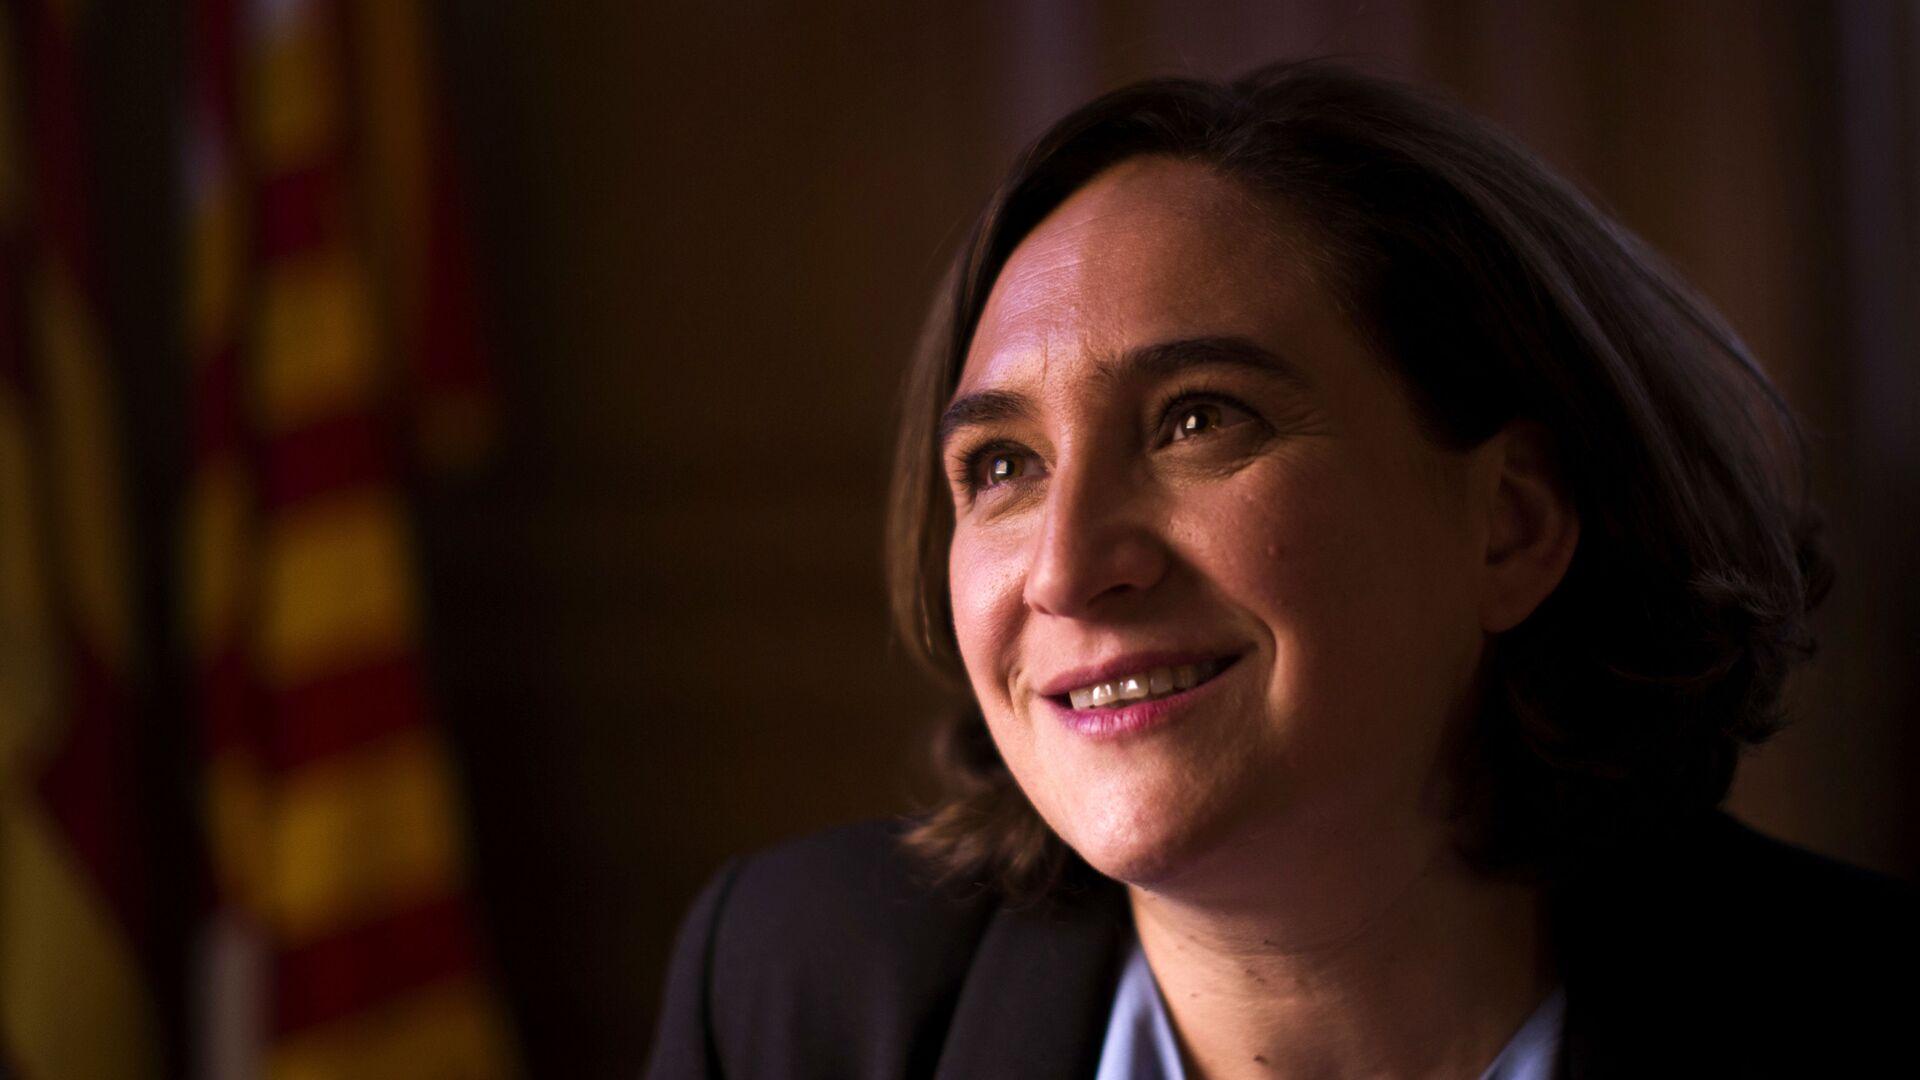 Ada Colau, alcaldesa de Barcelona - Sputnik Mundo, 1920, 13.04.2021